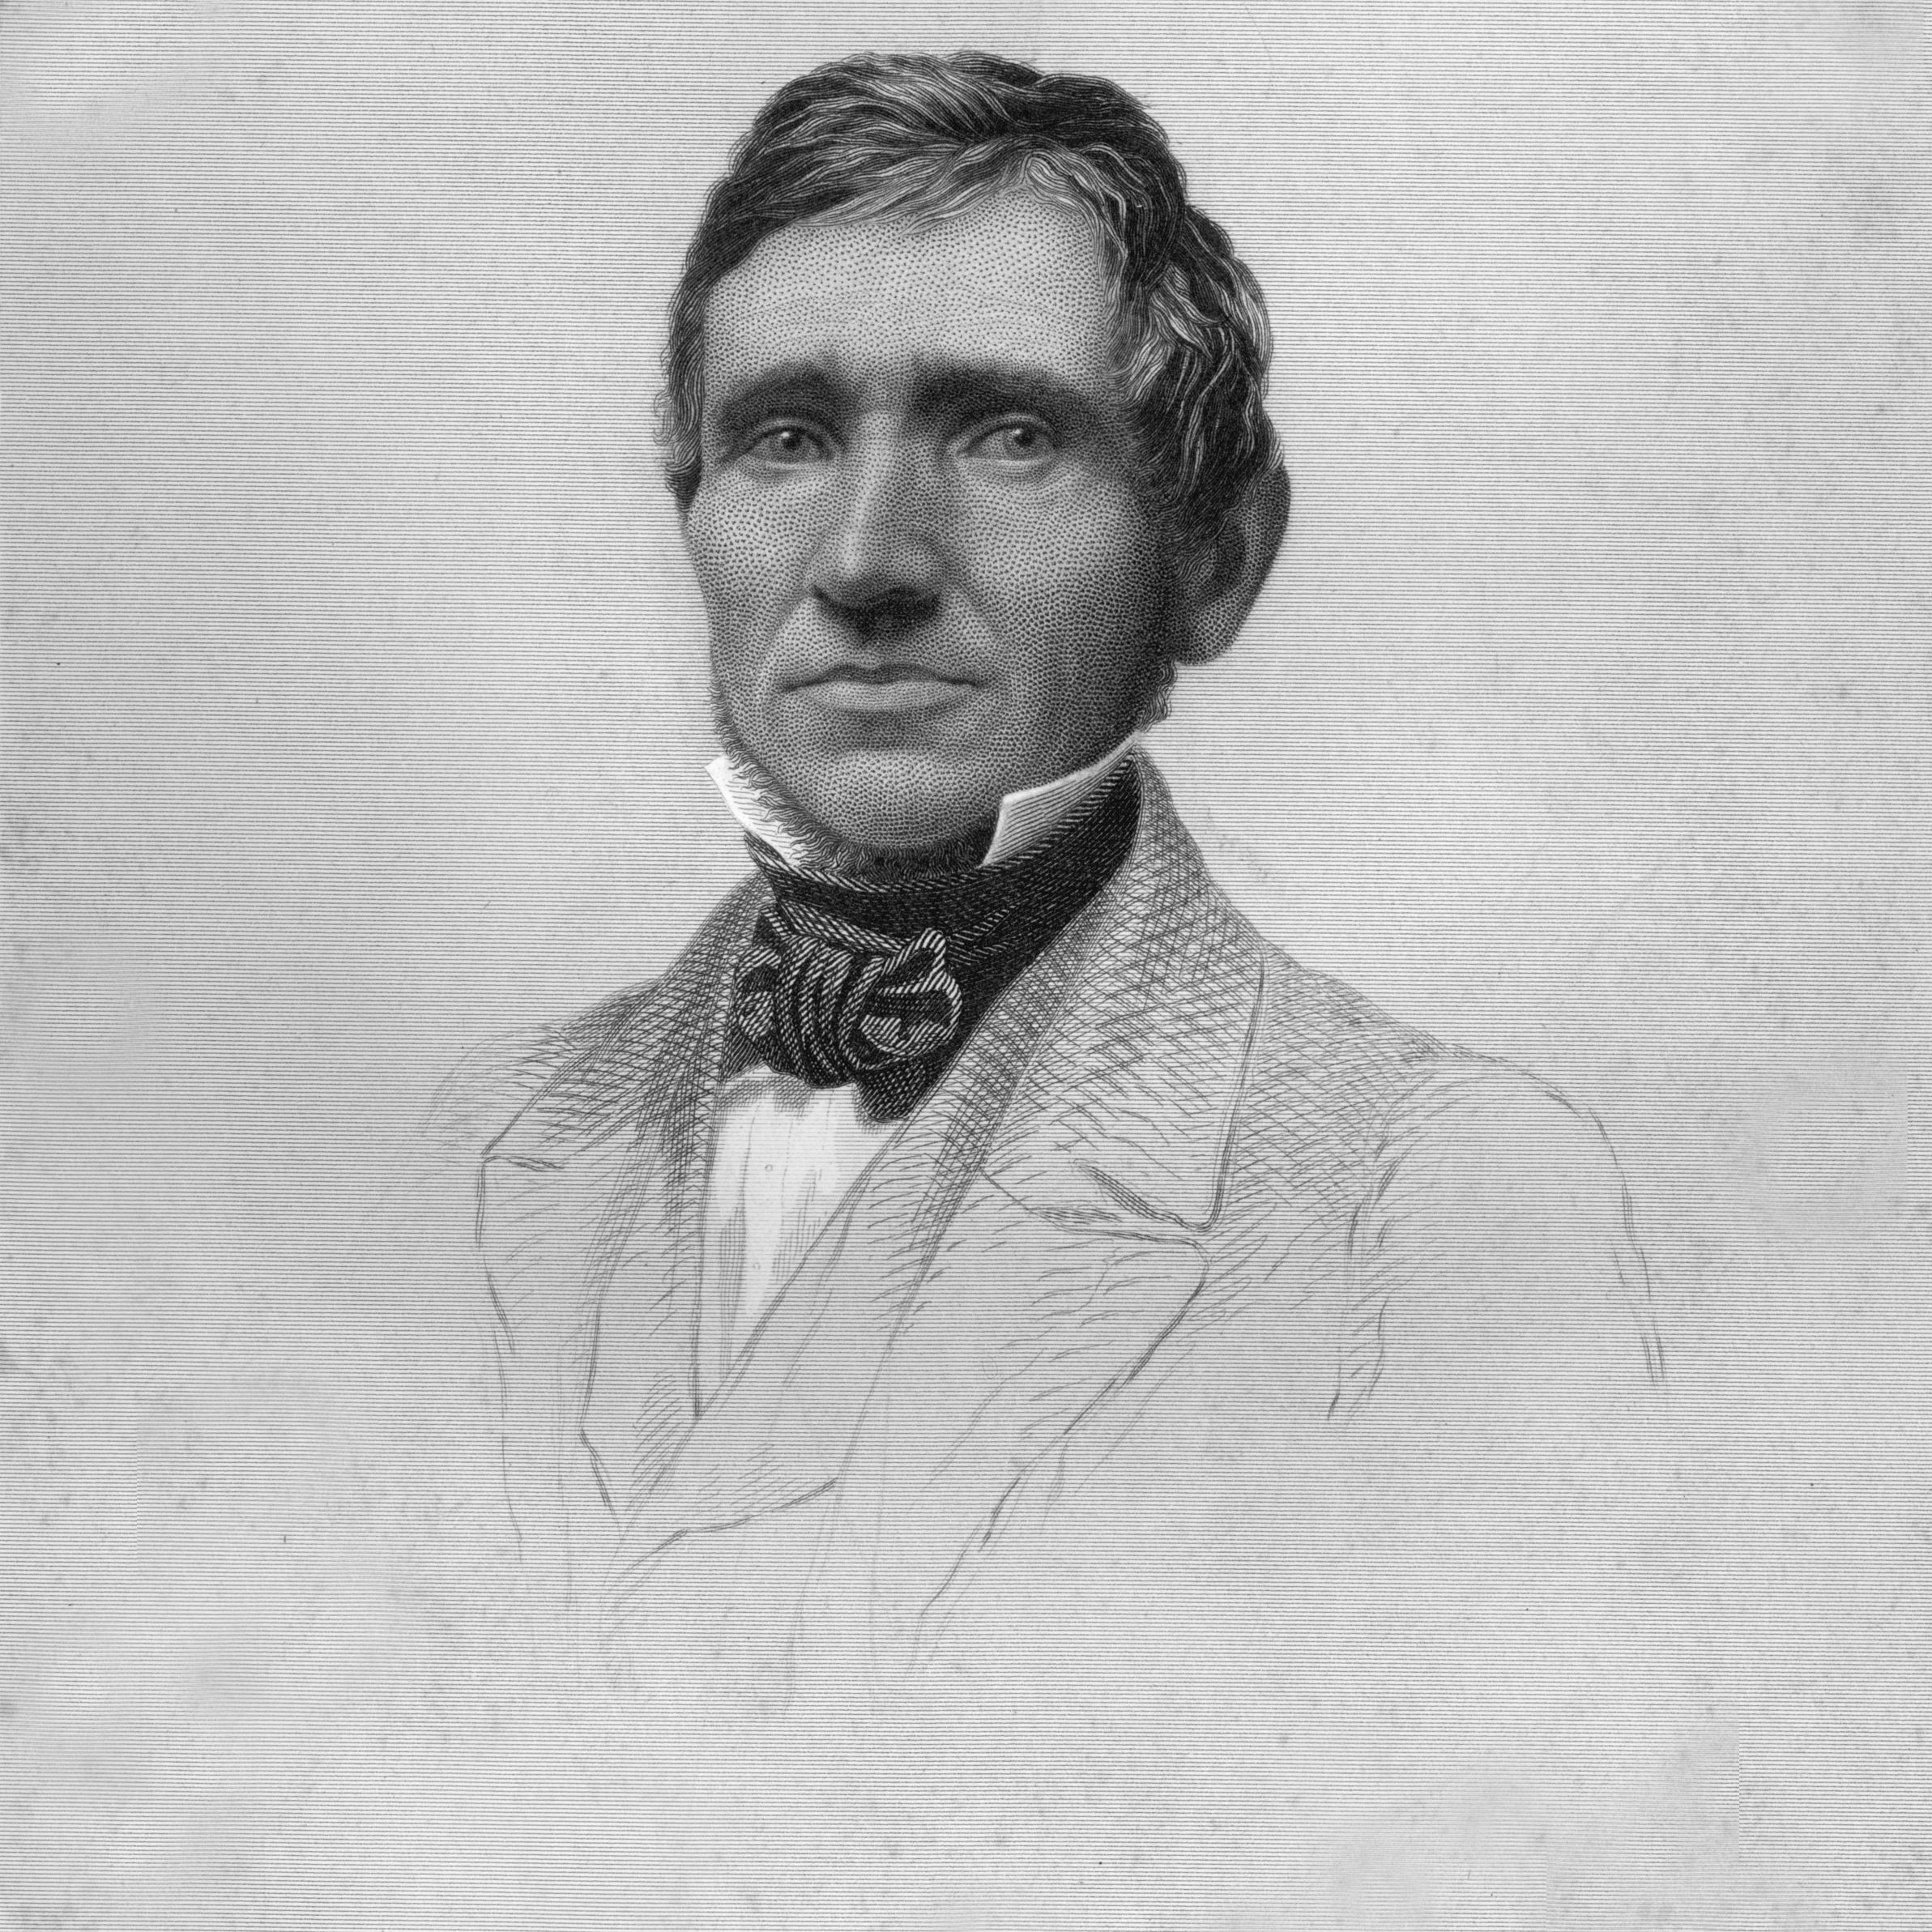 circa 1845: Portrait of American inventor Charles Goodyear (1800 - 1860).